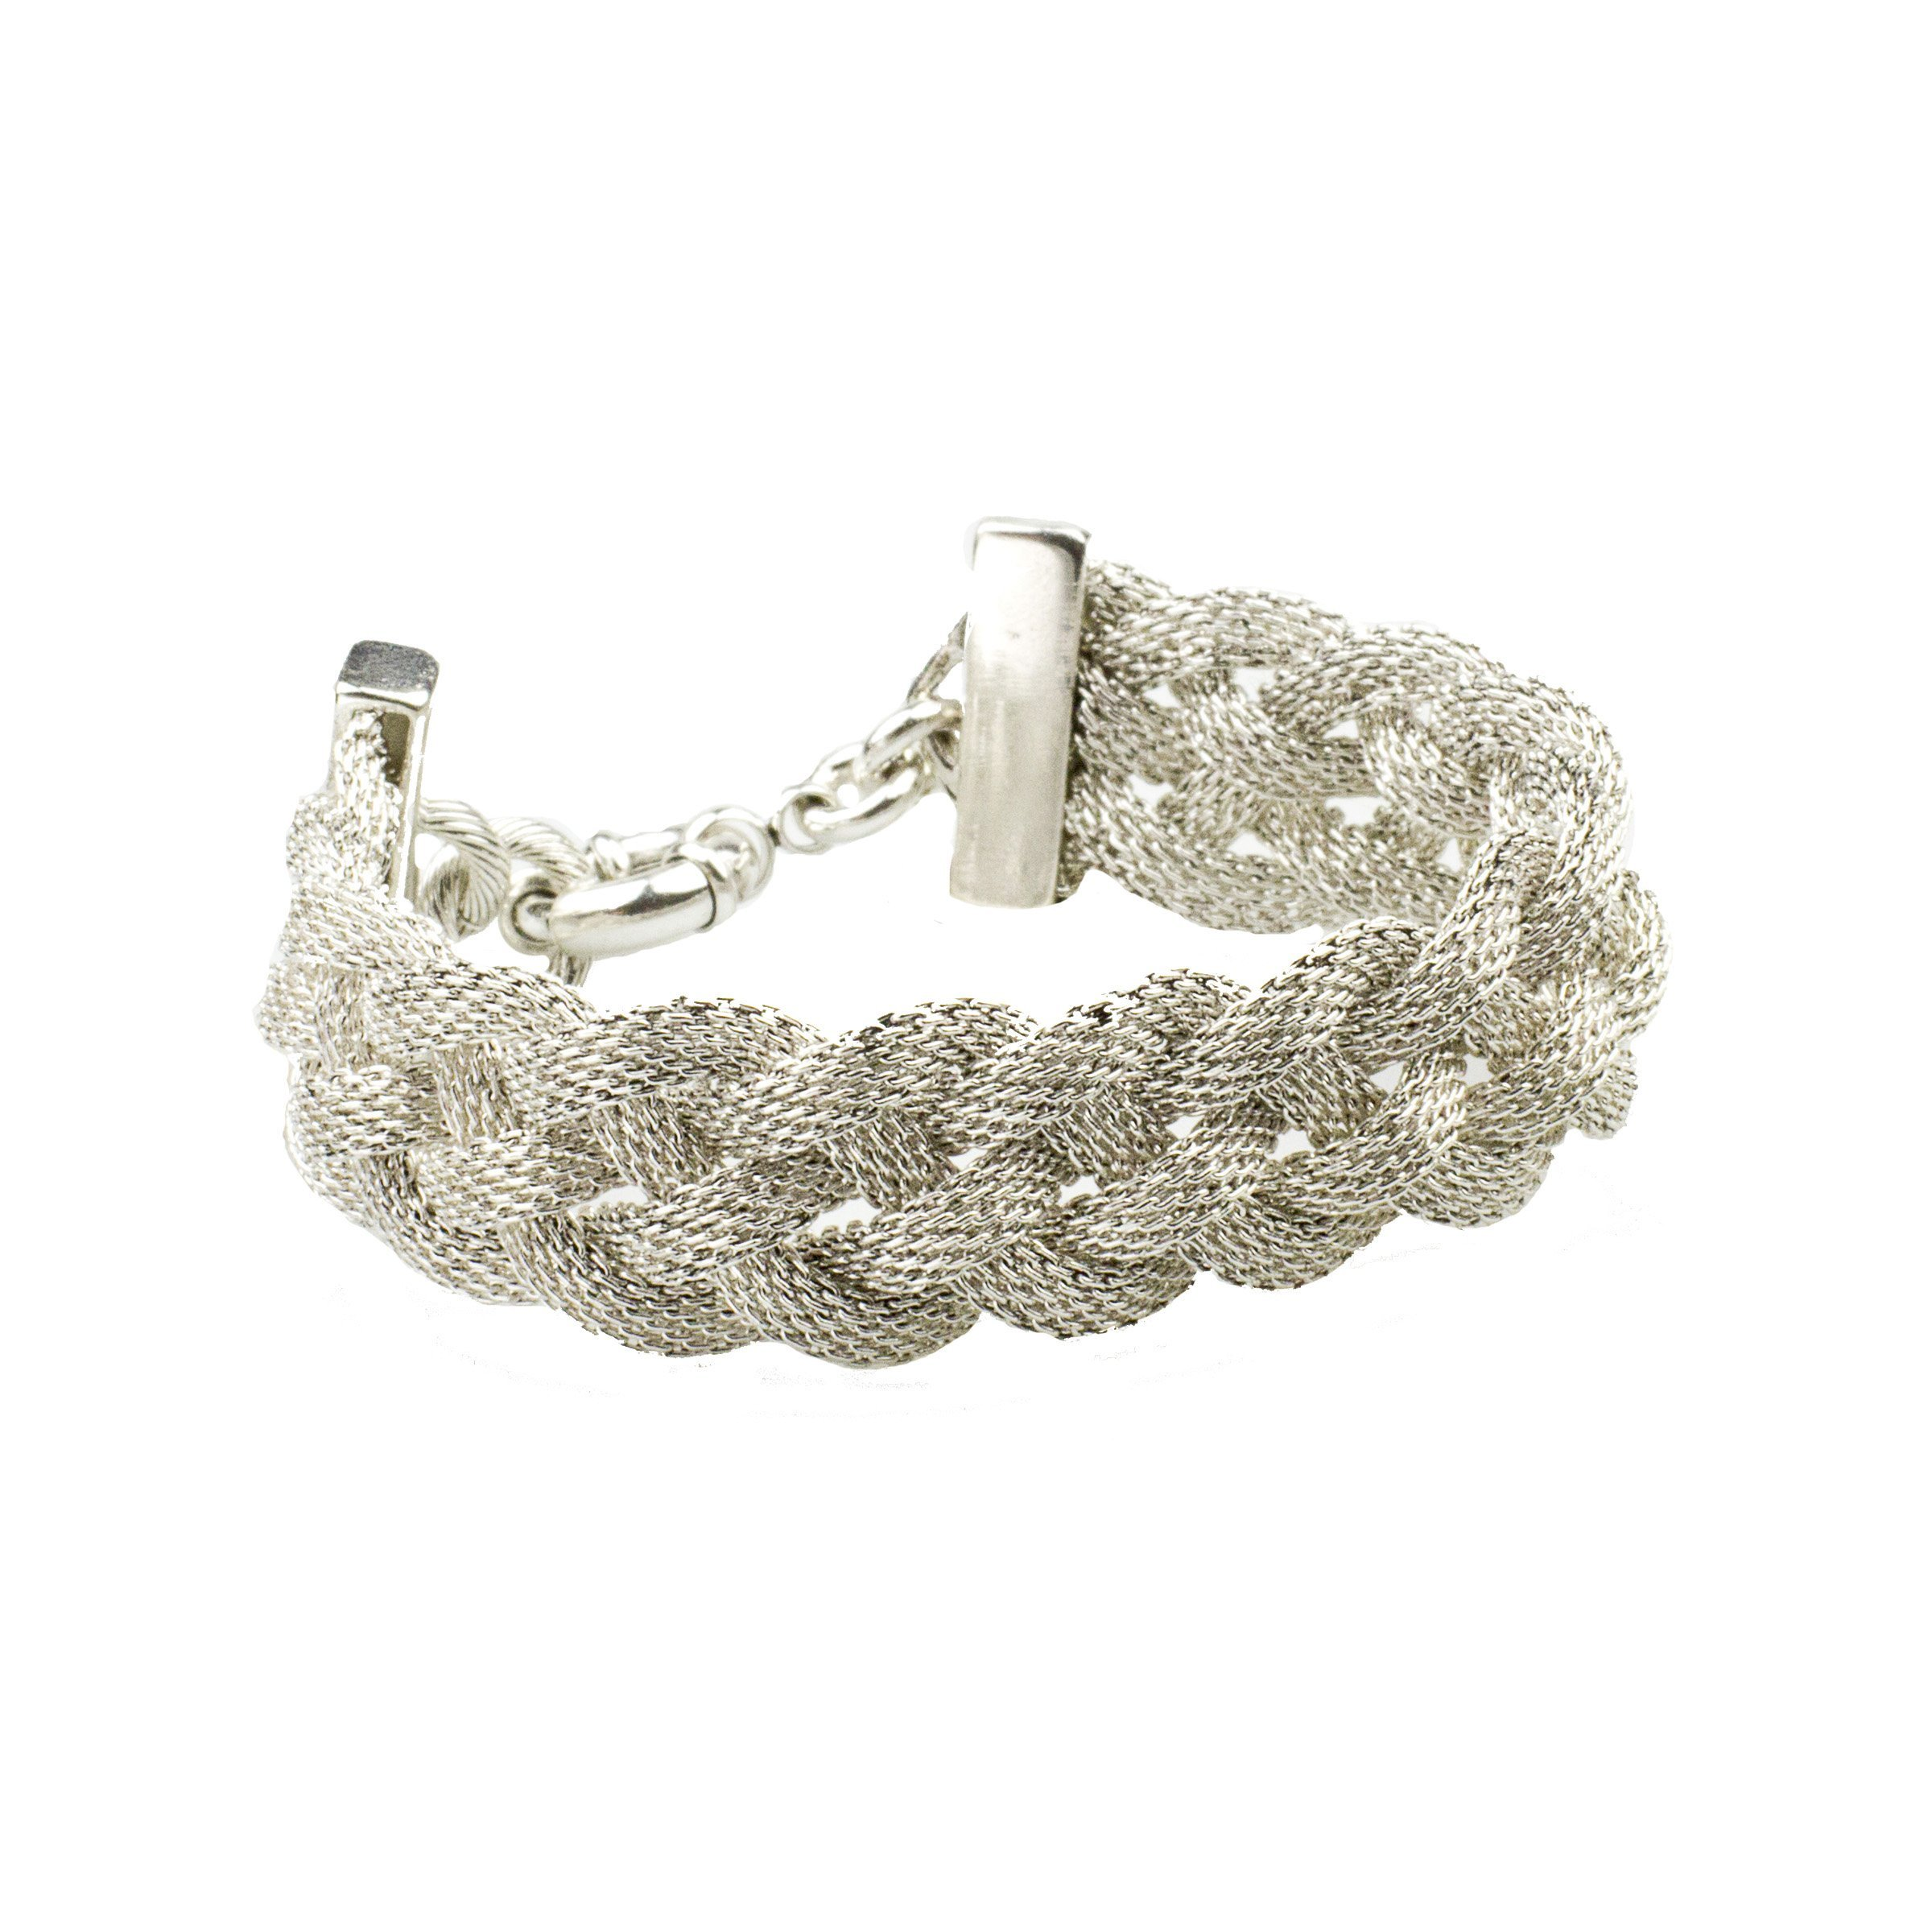 John Wind Silver Braided Mesh Cuff Bracelet, 7-7.5''